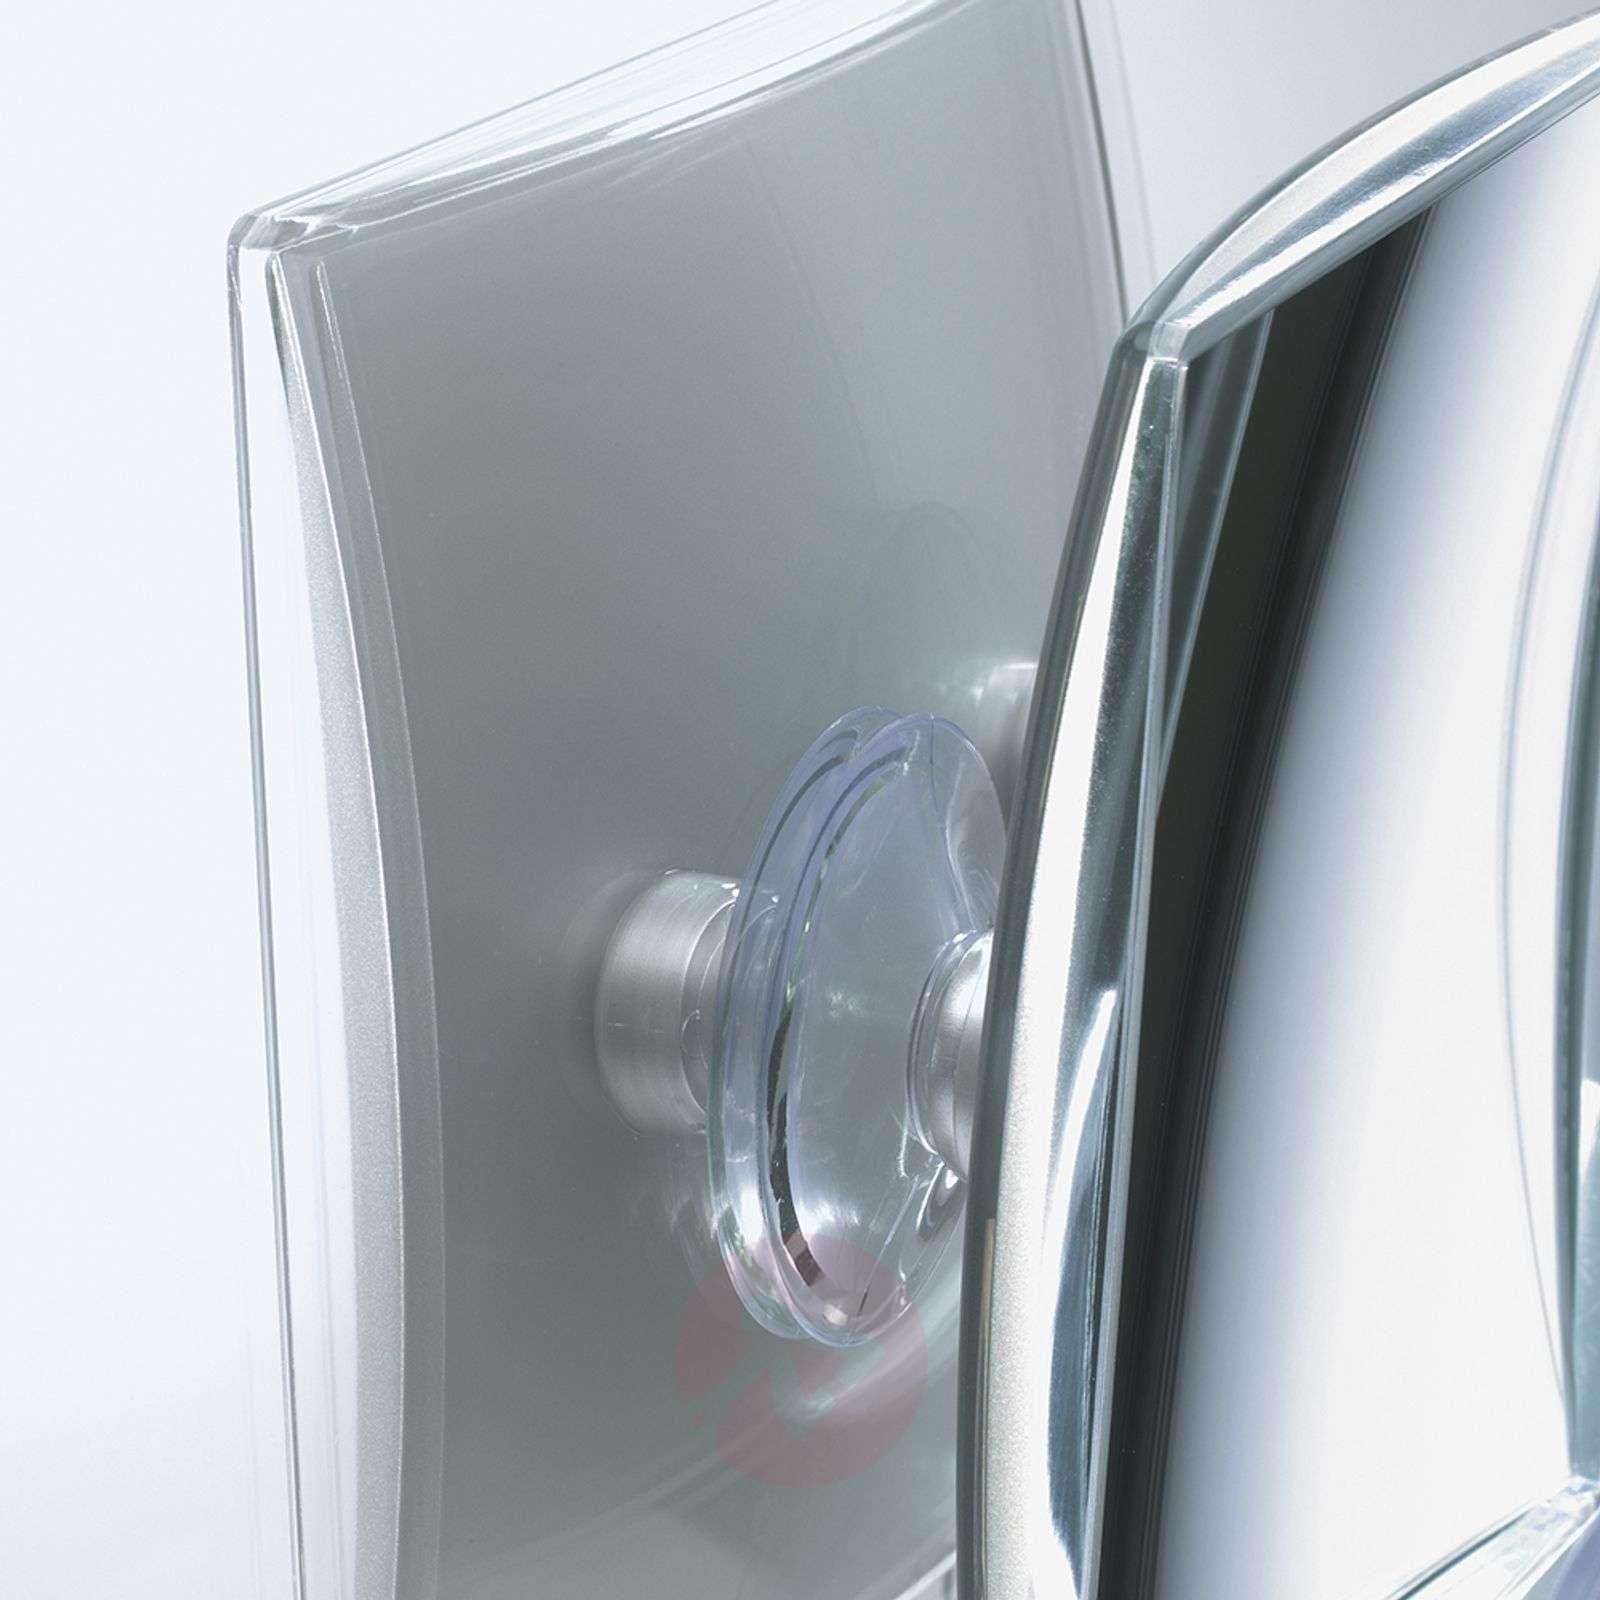 SPT 41 practical cosmetic mirror-2504354X-01